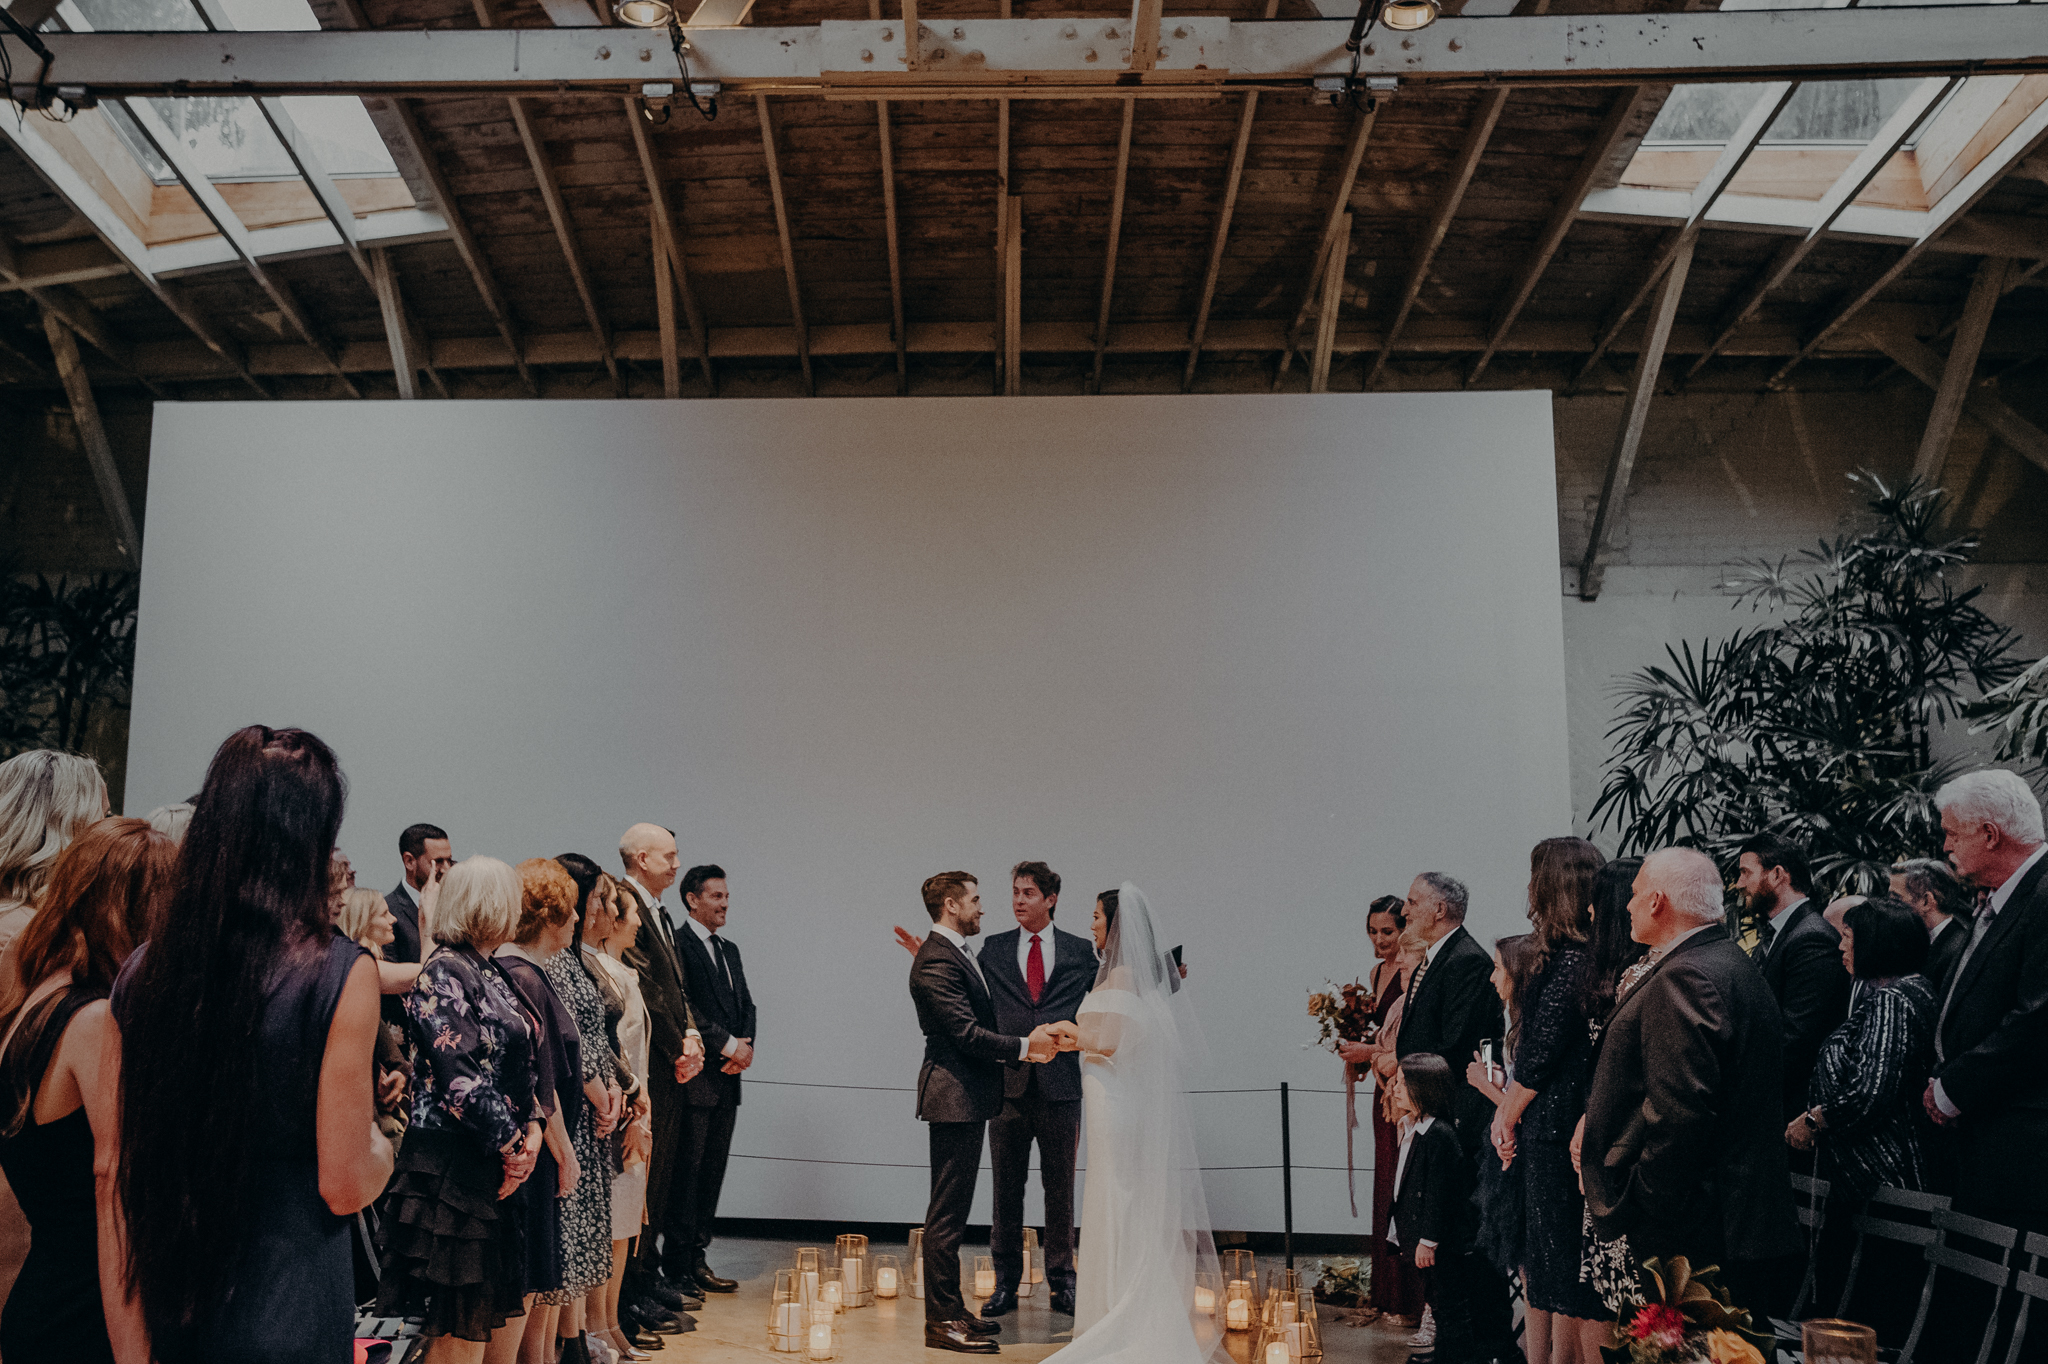 Wedding Photo LA - wedding photographer in los angeles - millwick wedding venue -isaiahandtaylor.com-094.jpg